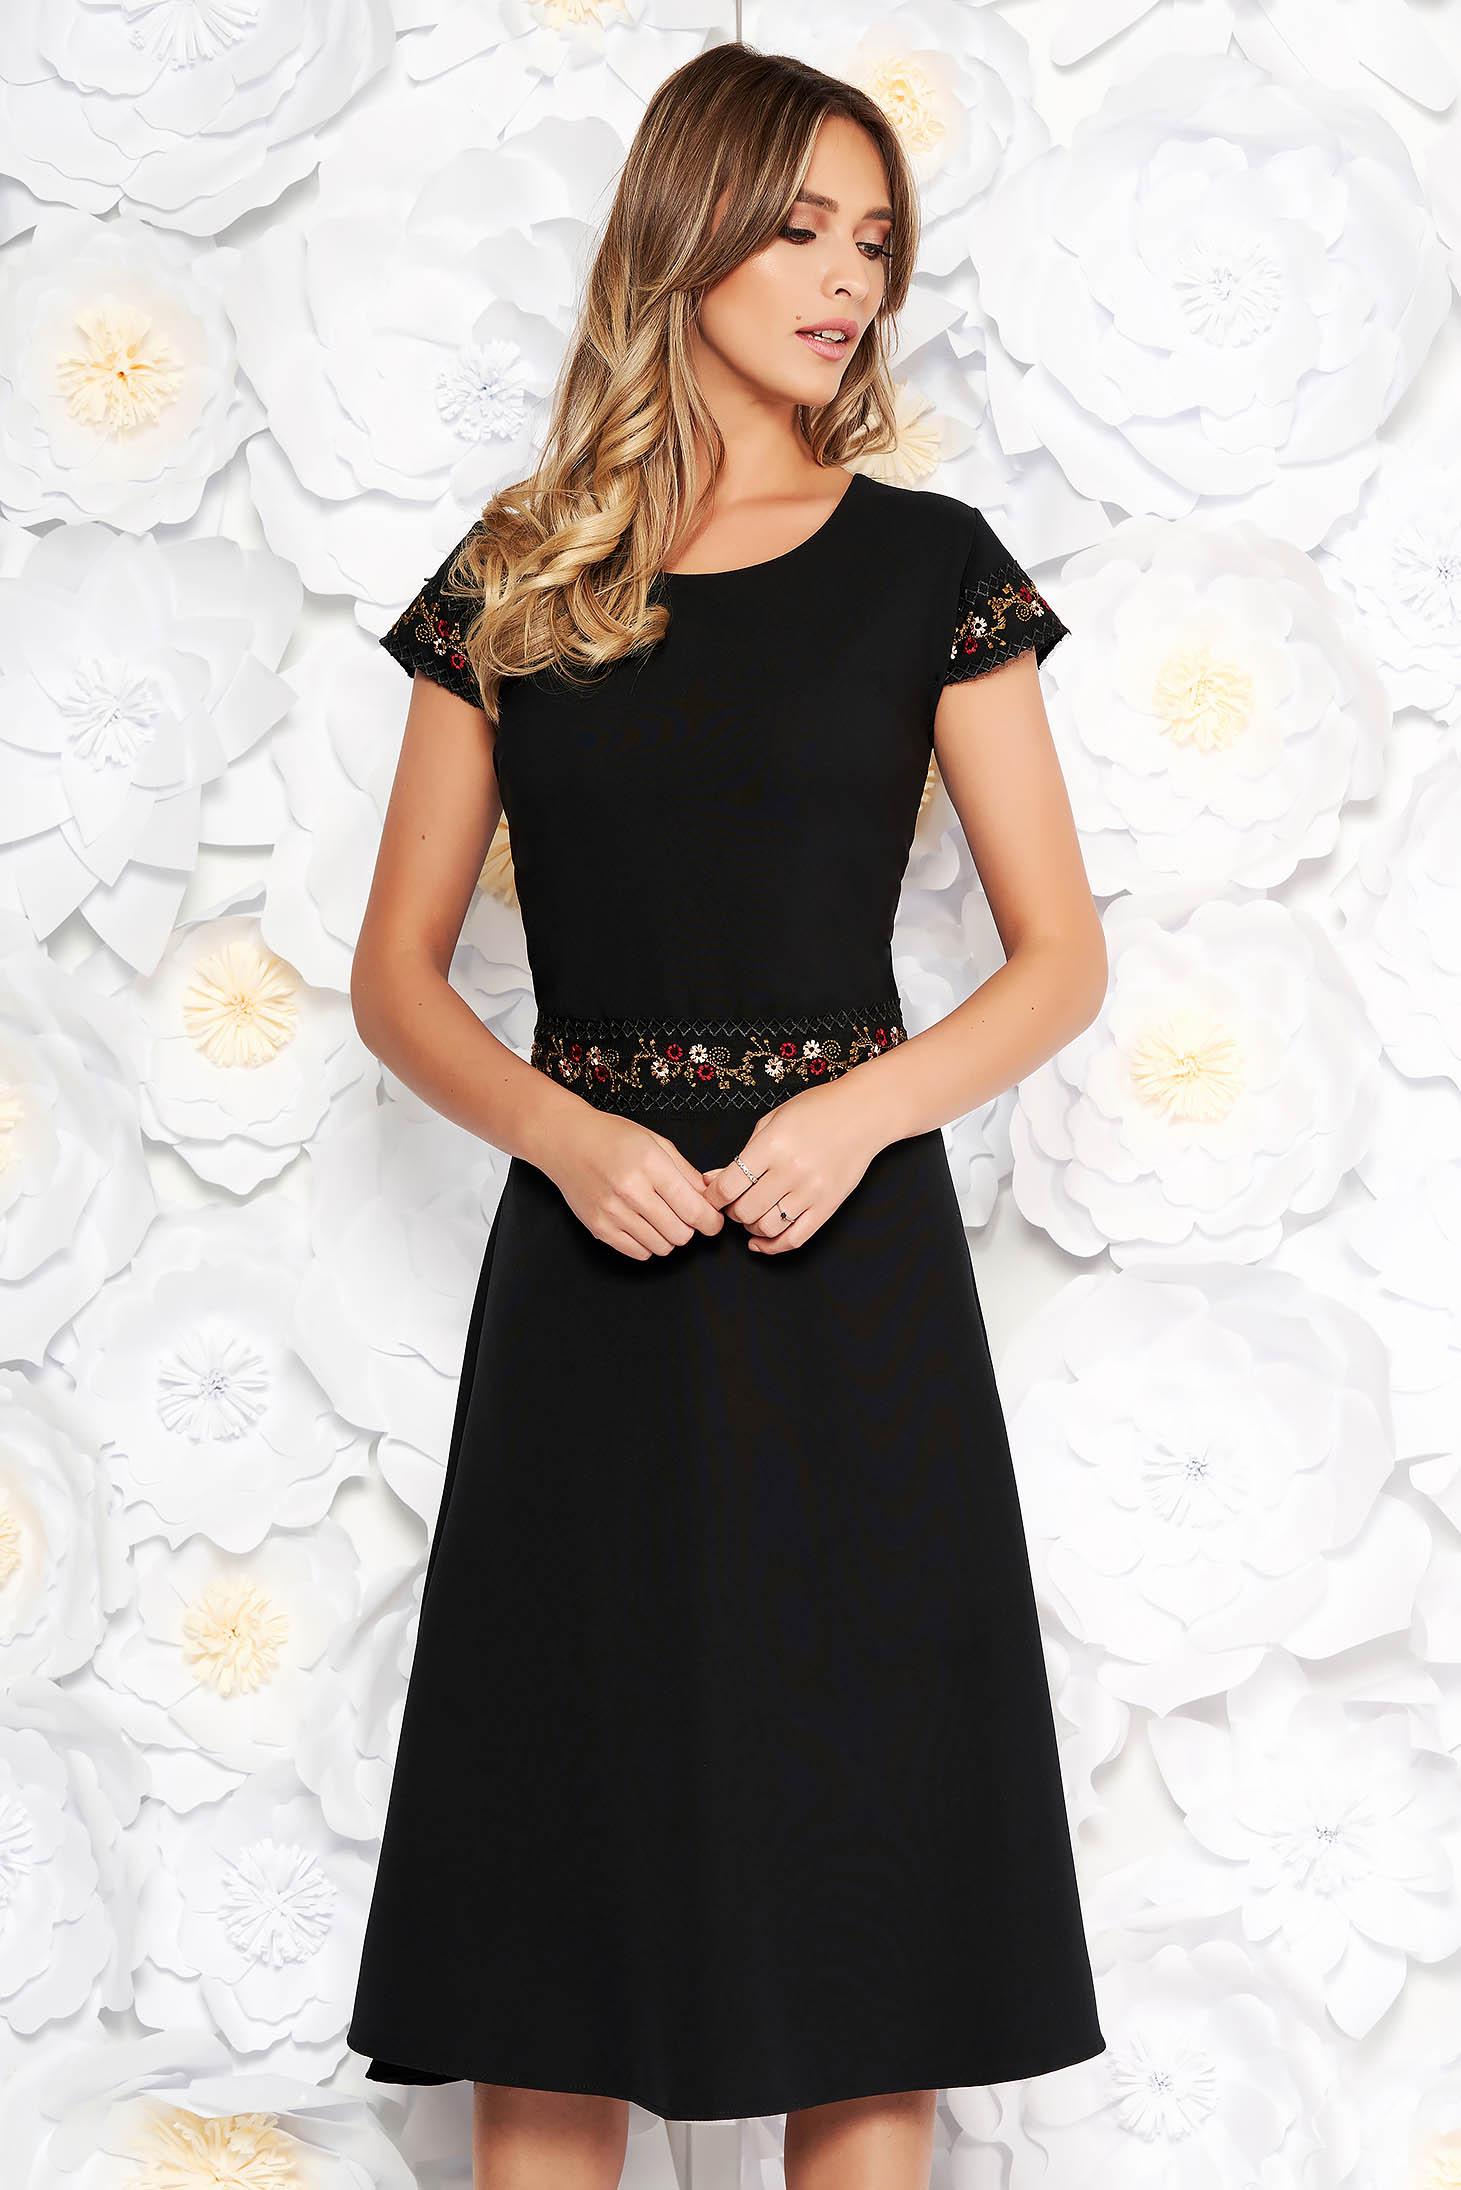 Rochie neagra eleganta midi in clos din stofa usor elastica cu insertii de broderie